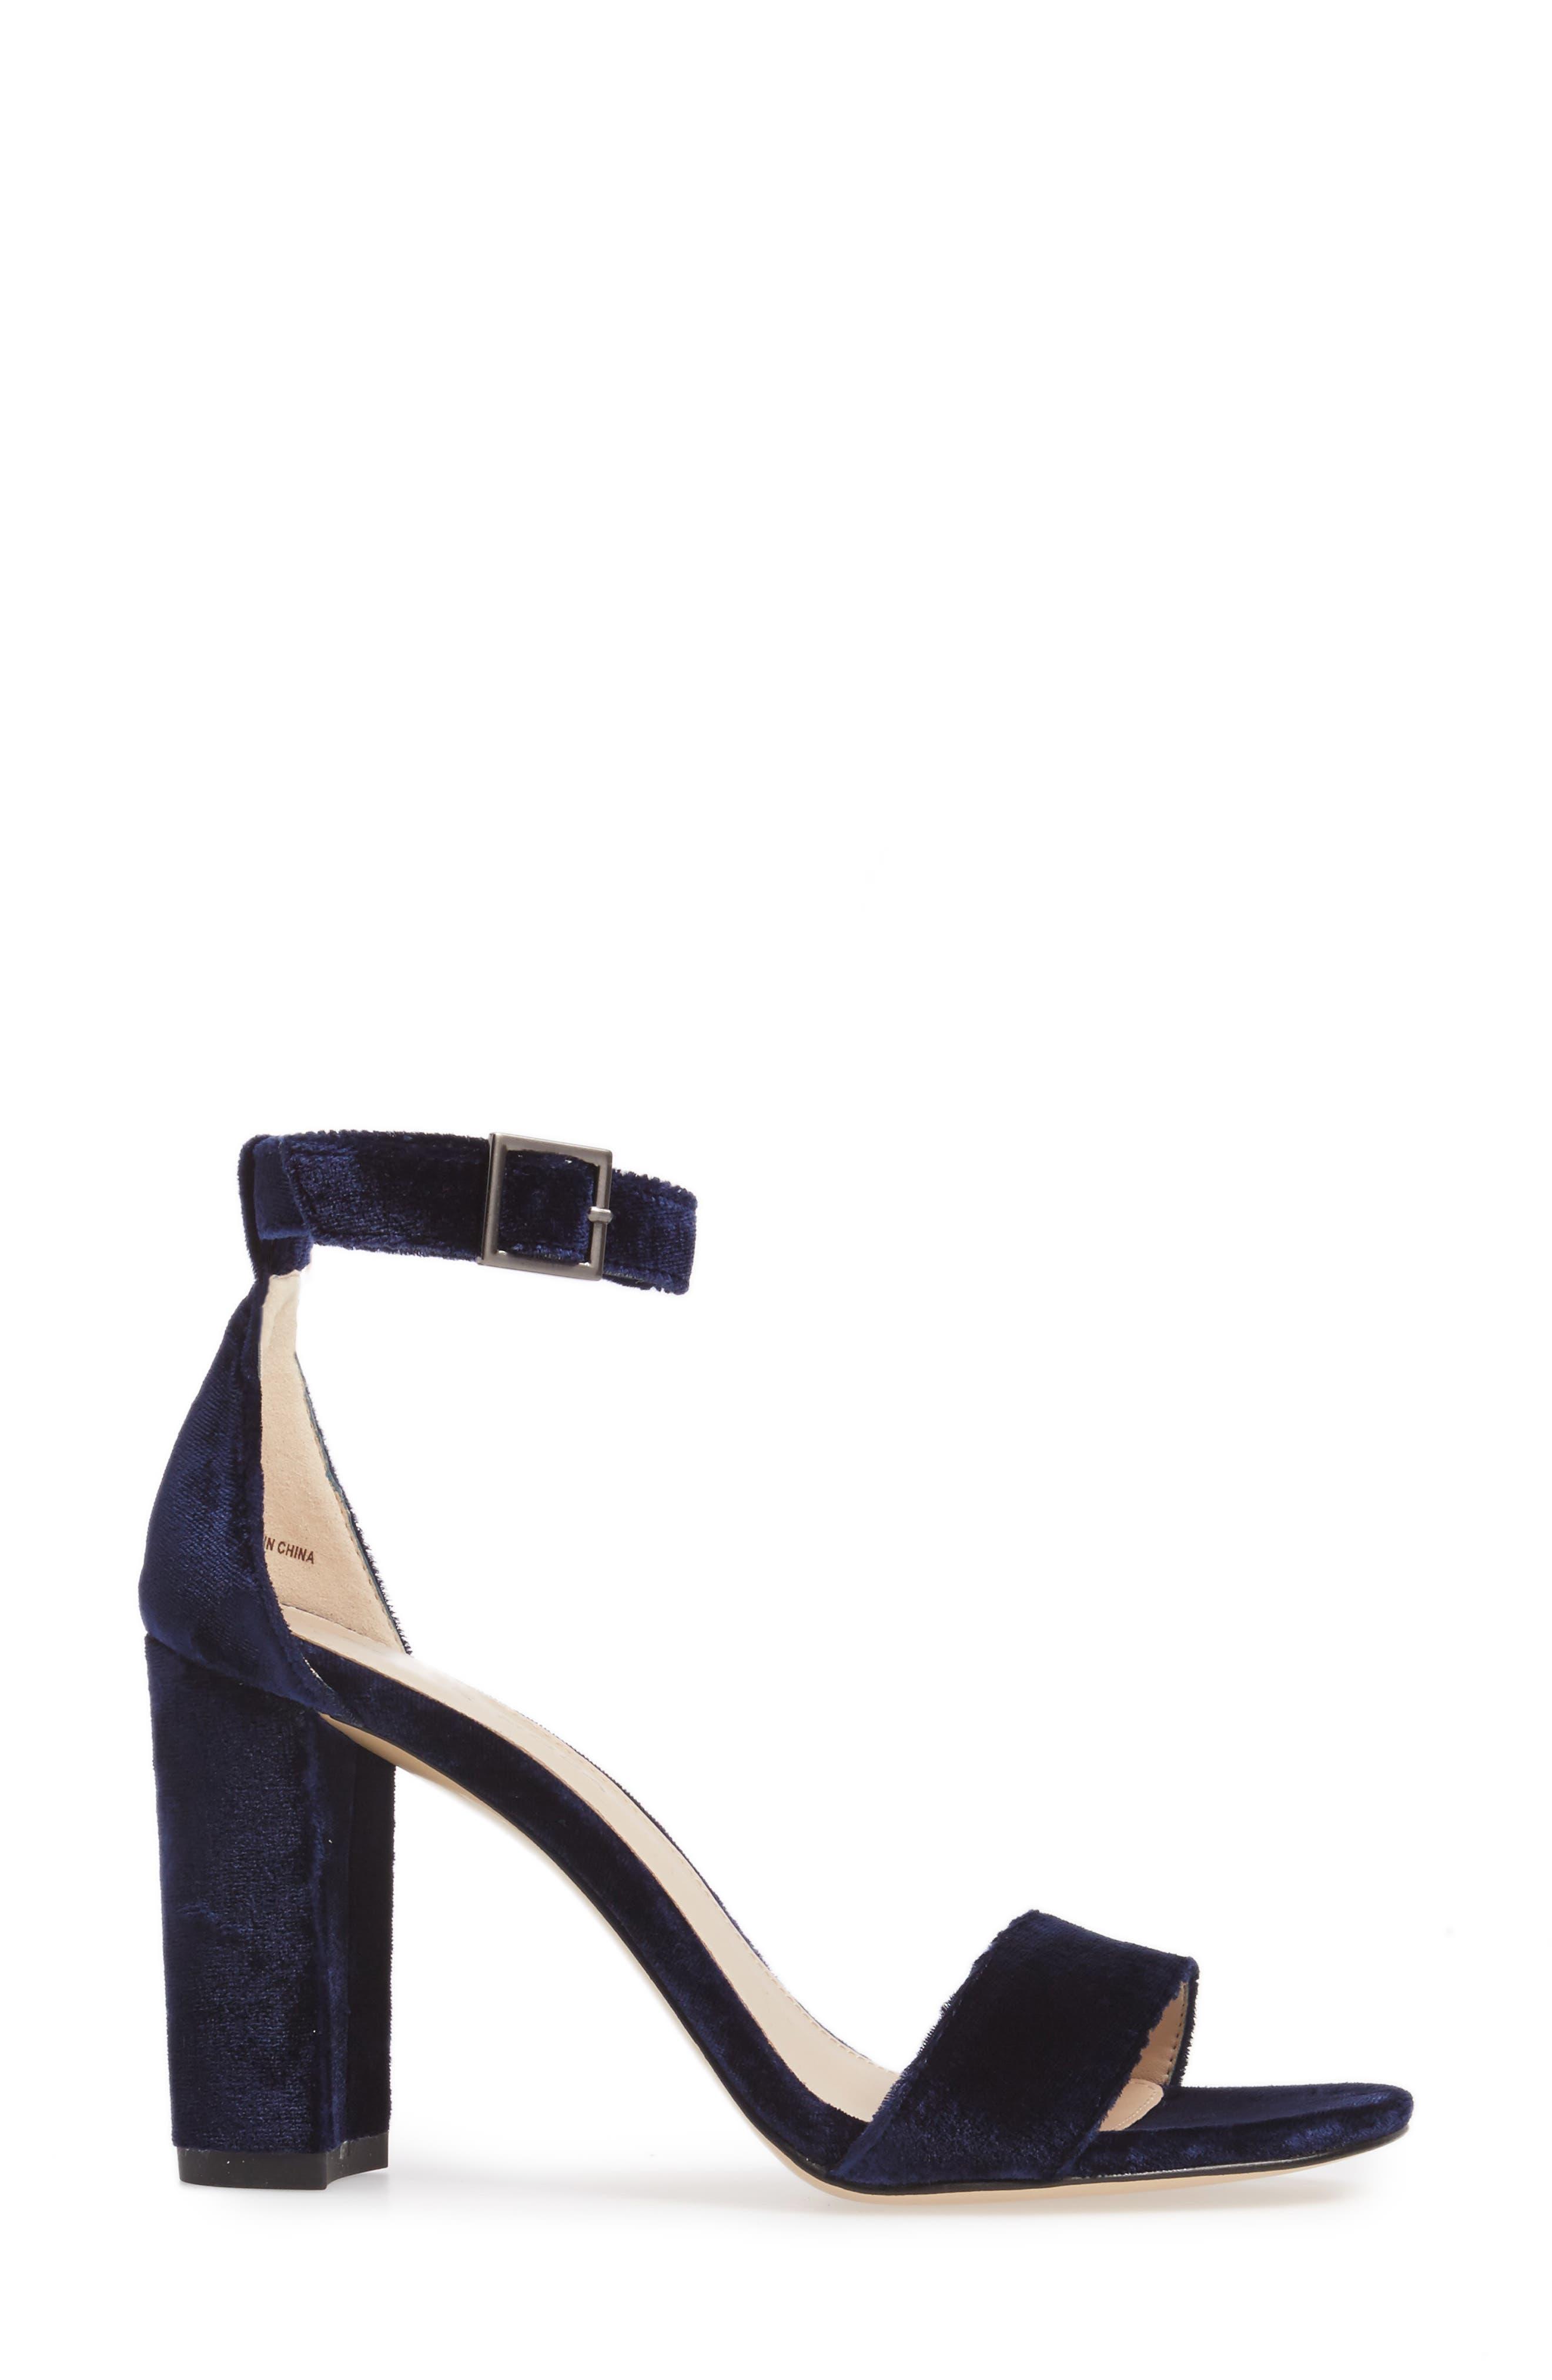 Bonnie Ankle Strap Sandal,                             Alternate thumbnail 3, color,                             Midnight